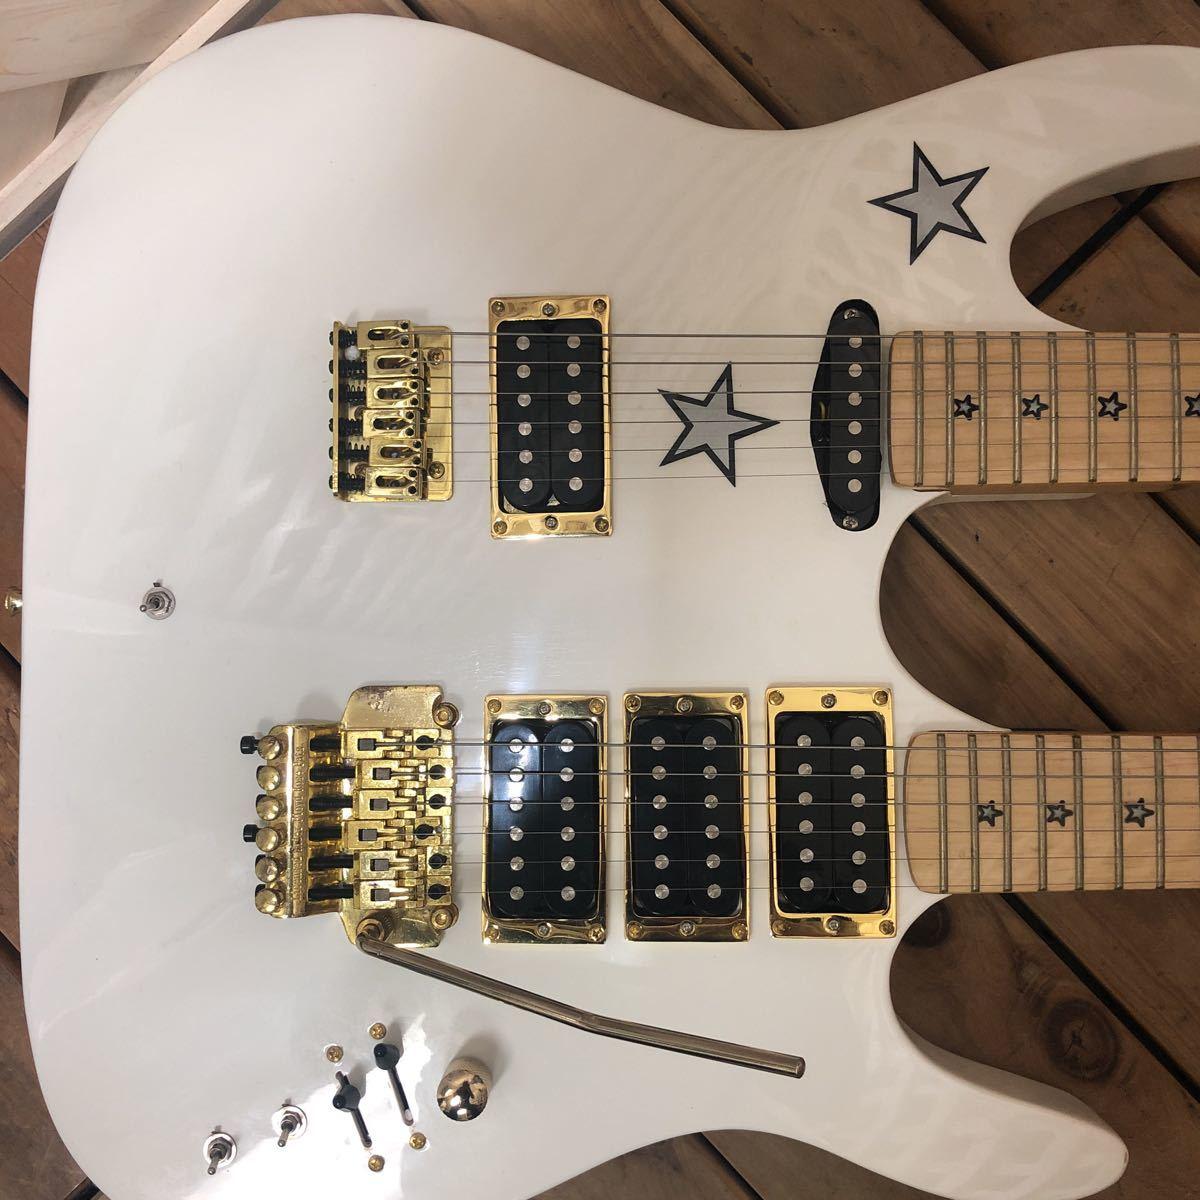 XM☆希少 KRAMER Richie sambora/Bon Jovi signature 激レア ダブルネック エレキギター リッチー・サンボラ モデル FLOYD ROSE搭載 美品